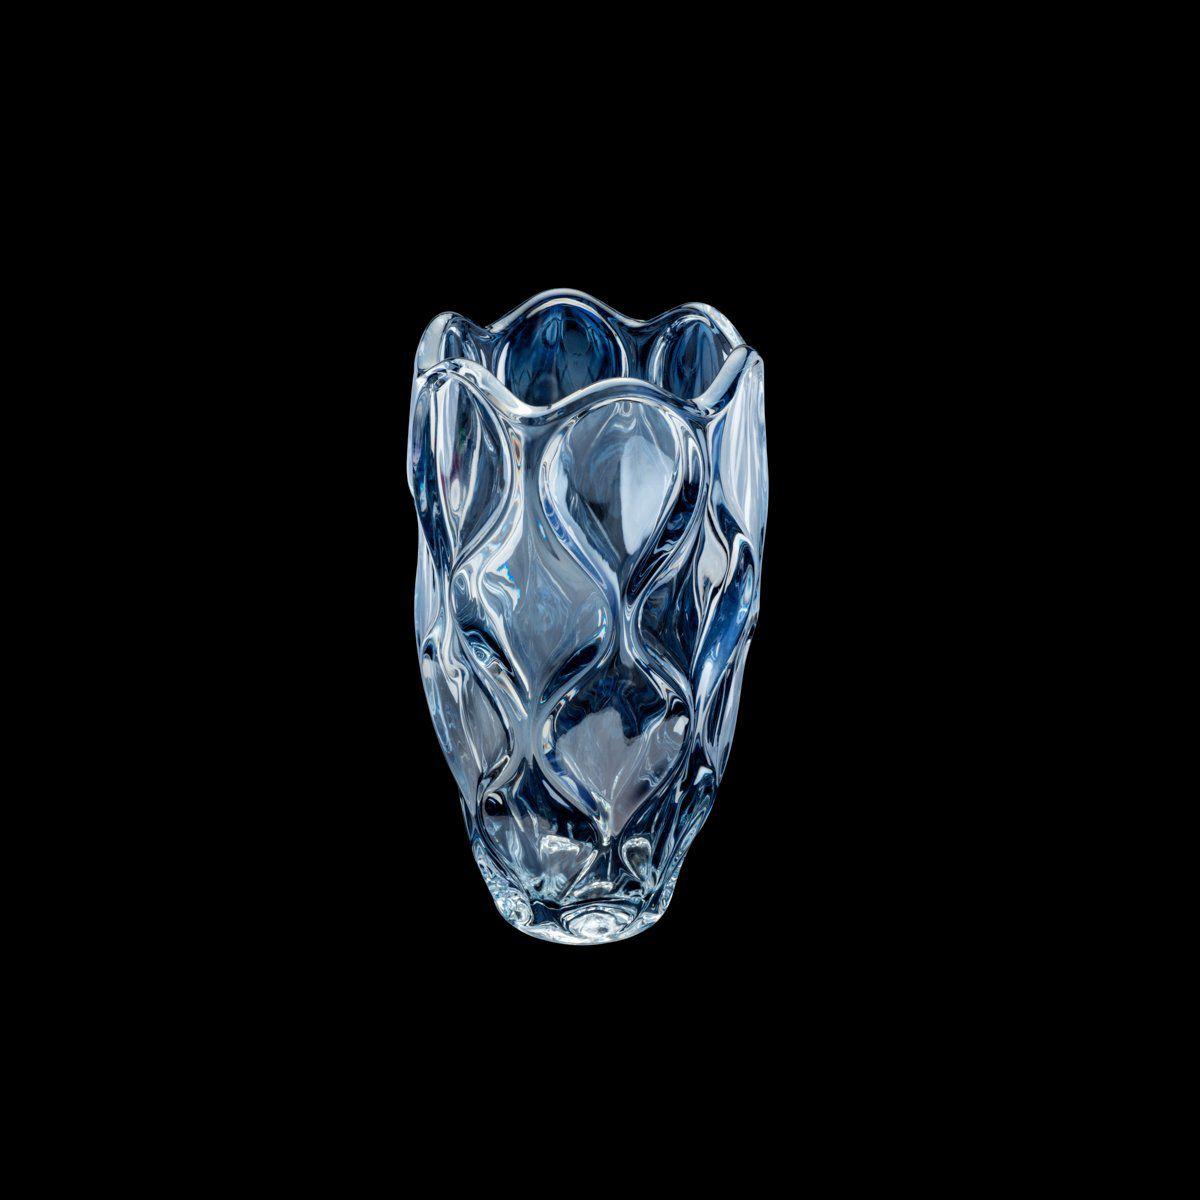 Vaso decorativo 30 cm de cristal azul Safir Wolff - 26048